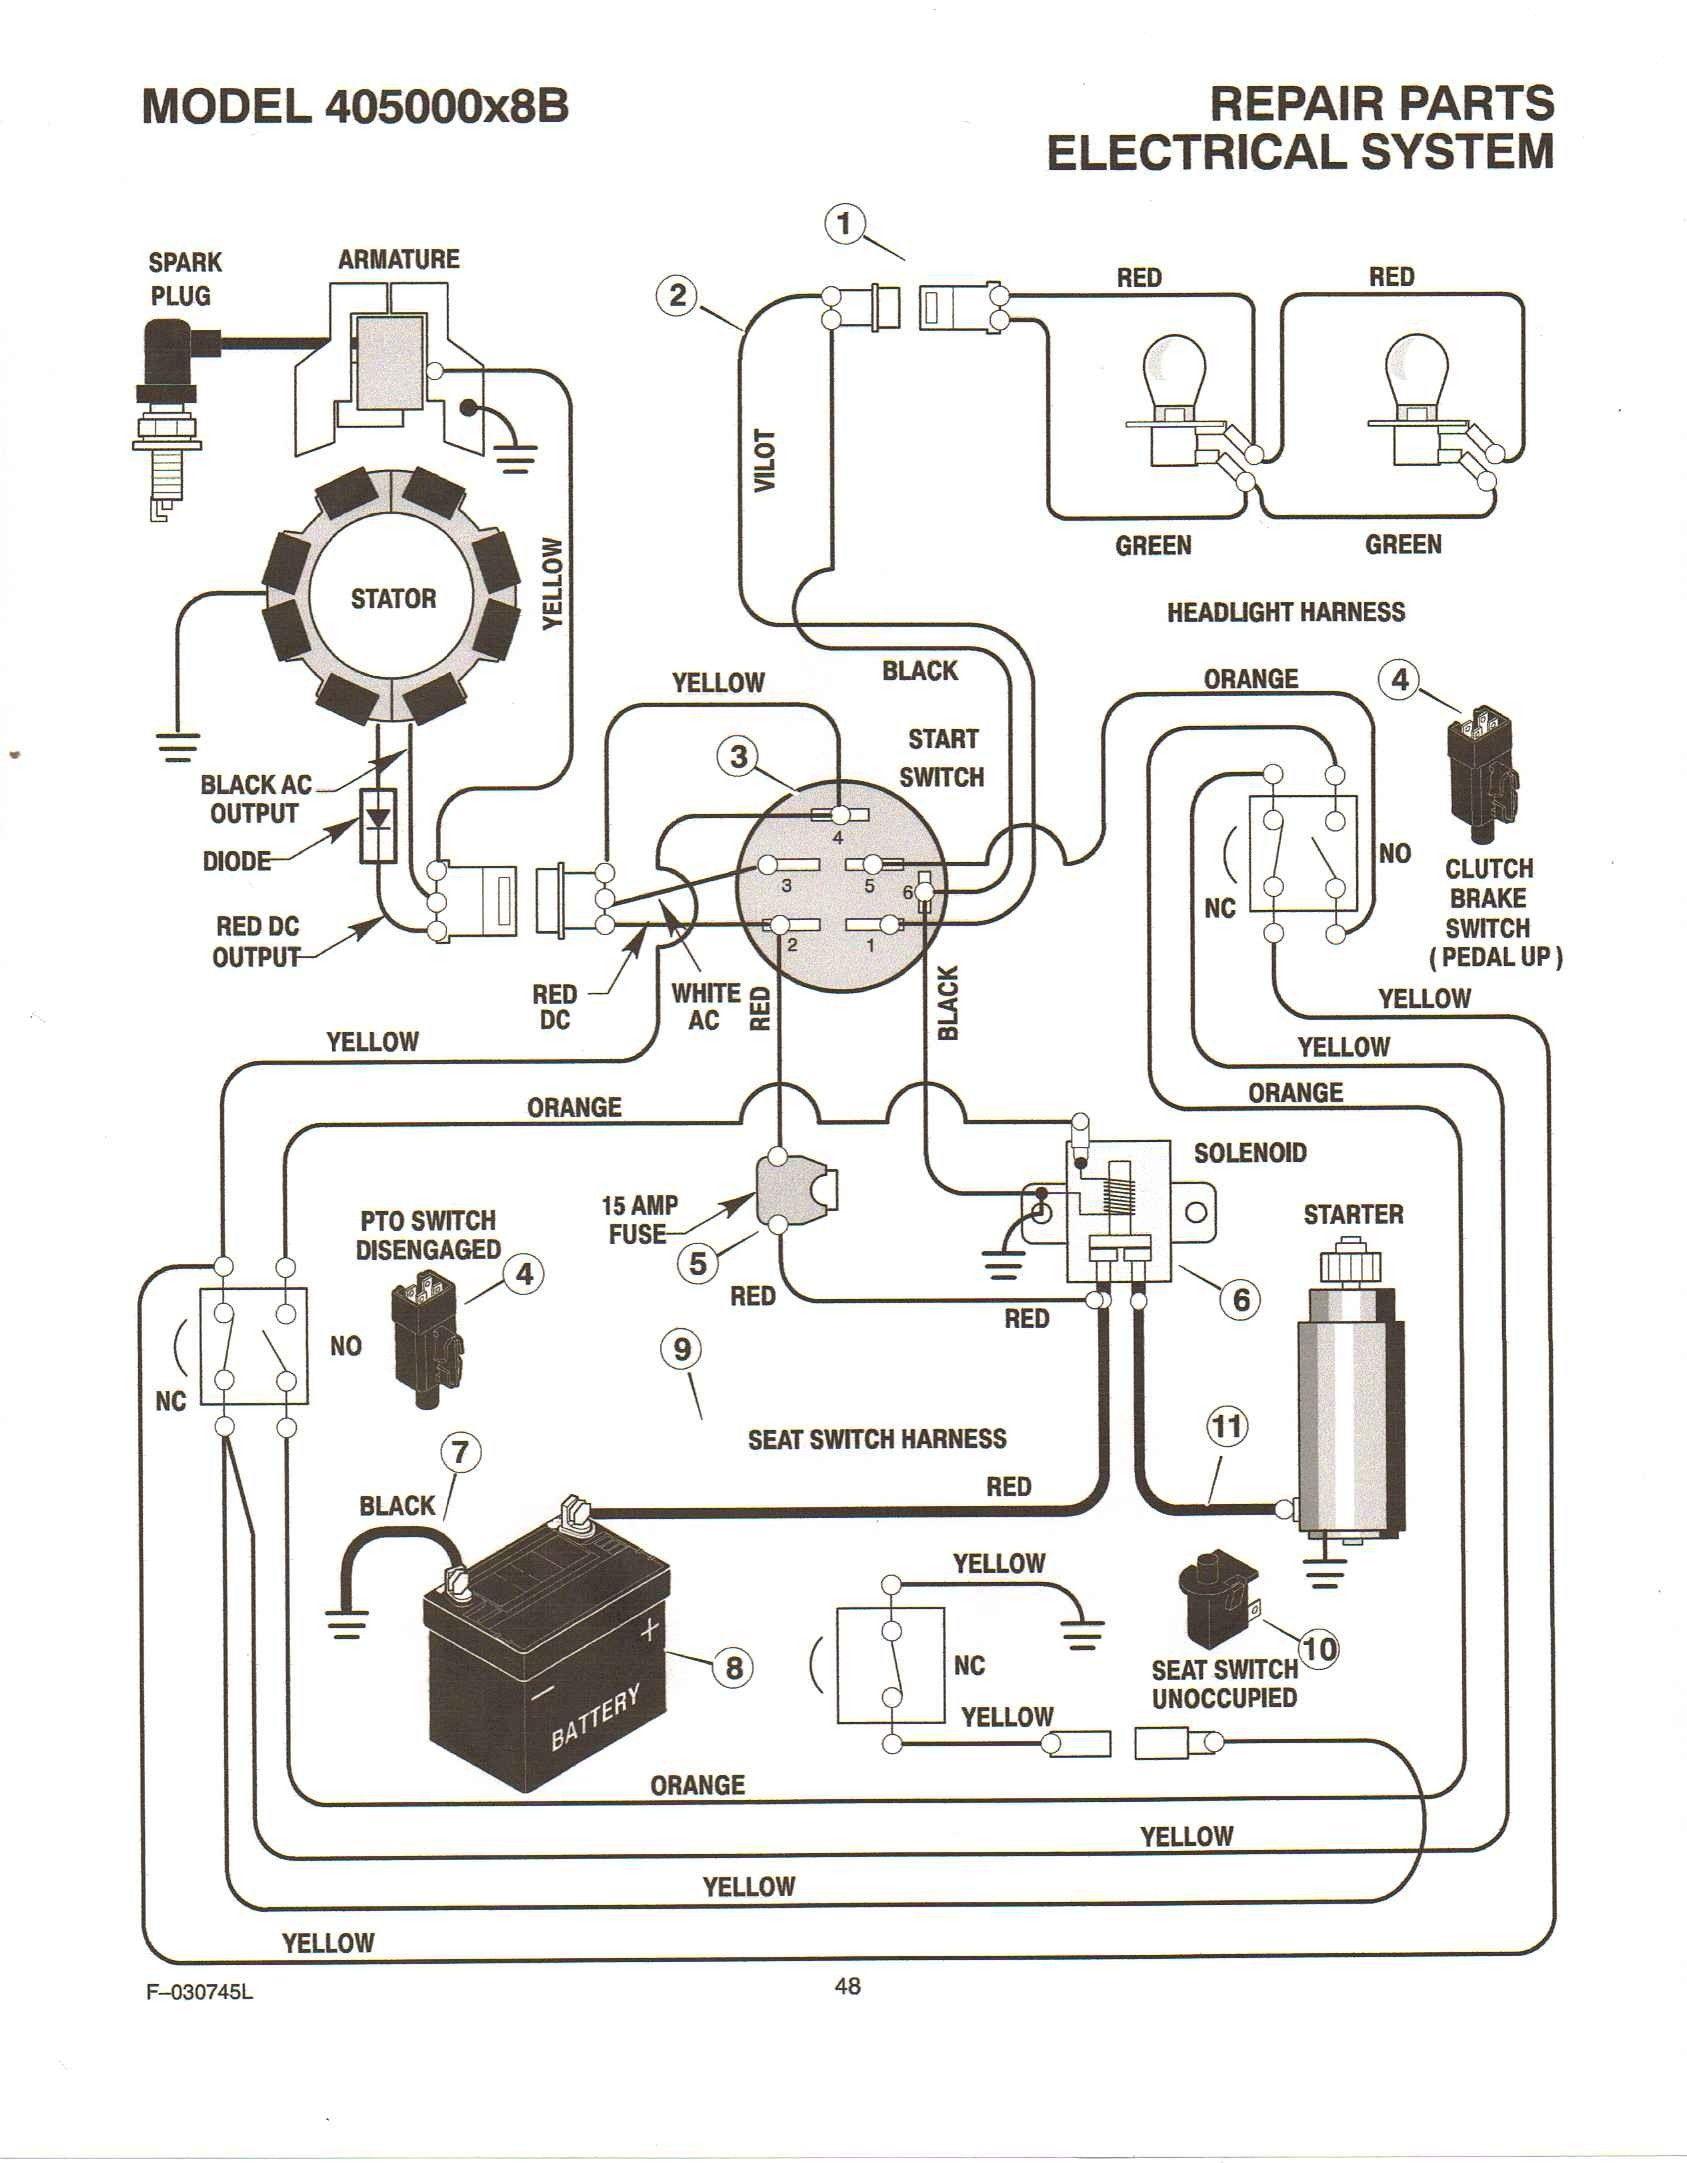 Kohler Engine Diagram in 2021 | Electrical diagram, Diagram, Kohler engines | Group Engine Diagram |  | Pinterest